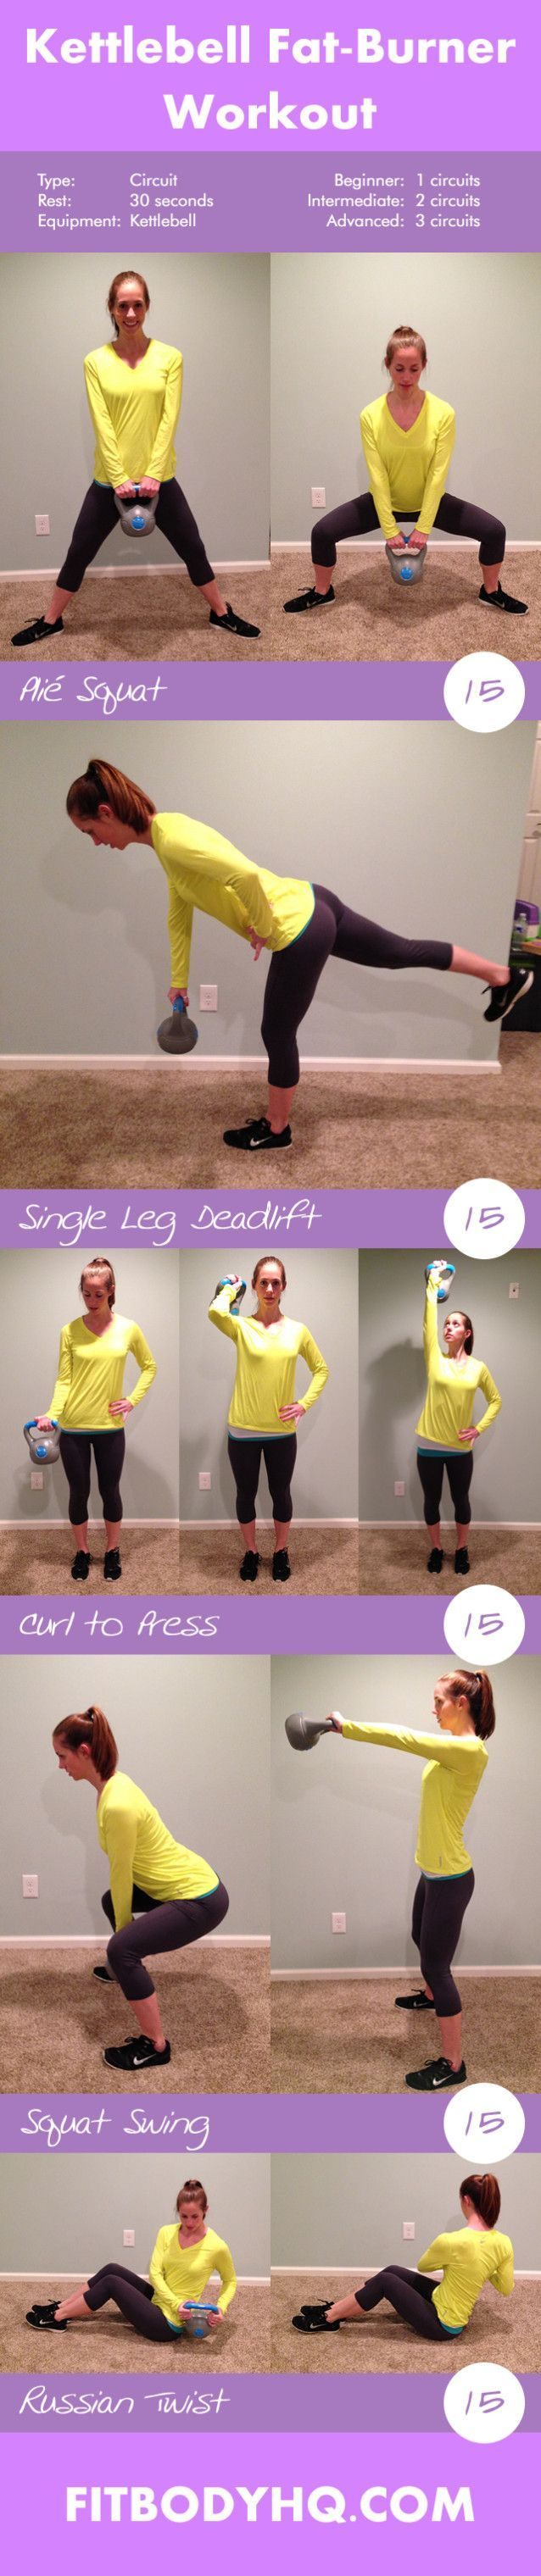 Kettlebell Fat-Burner Workout | FitBodyHQ